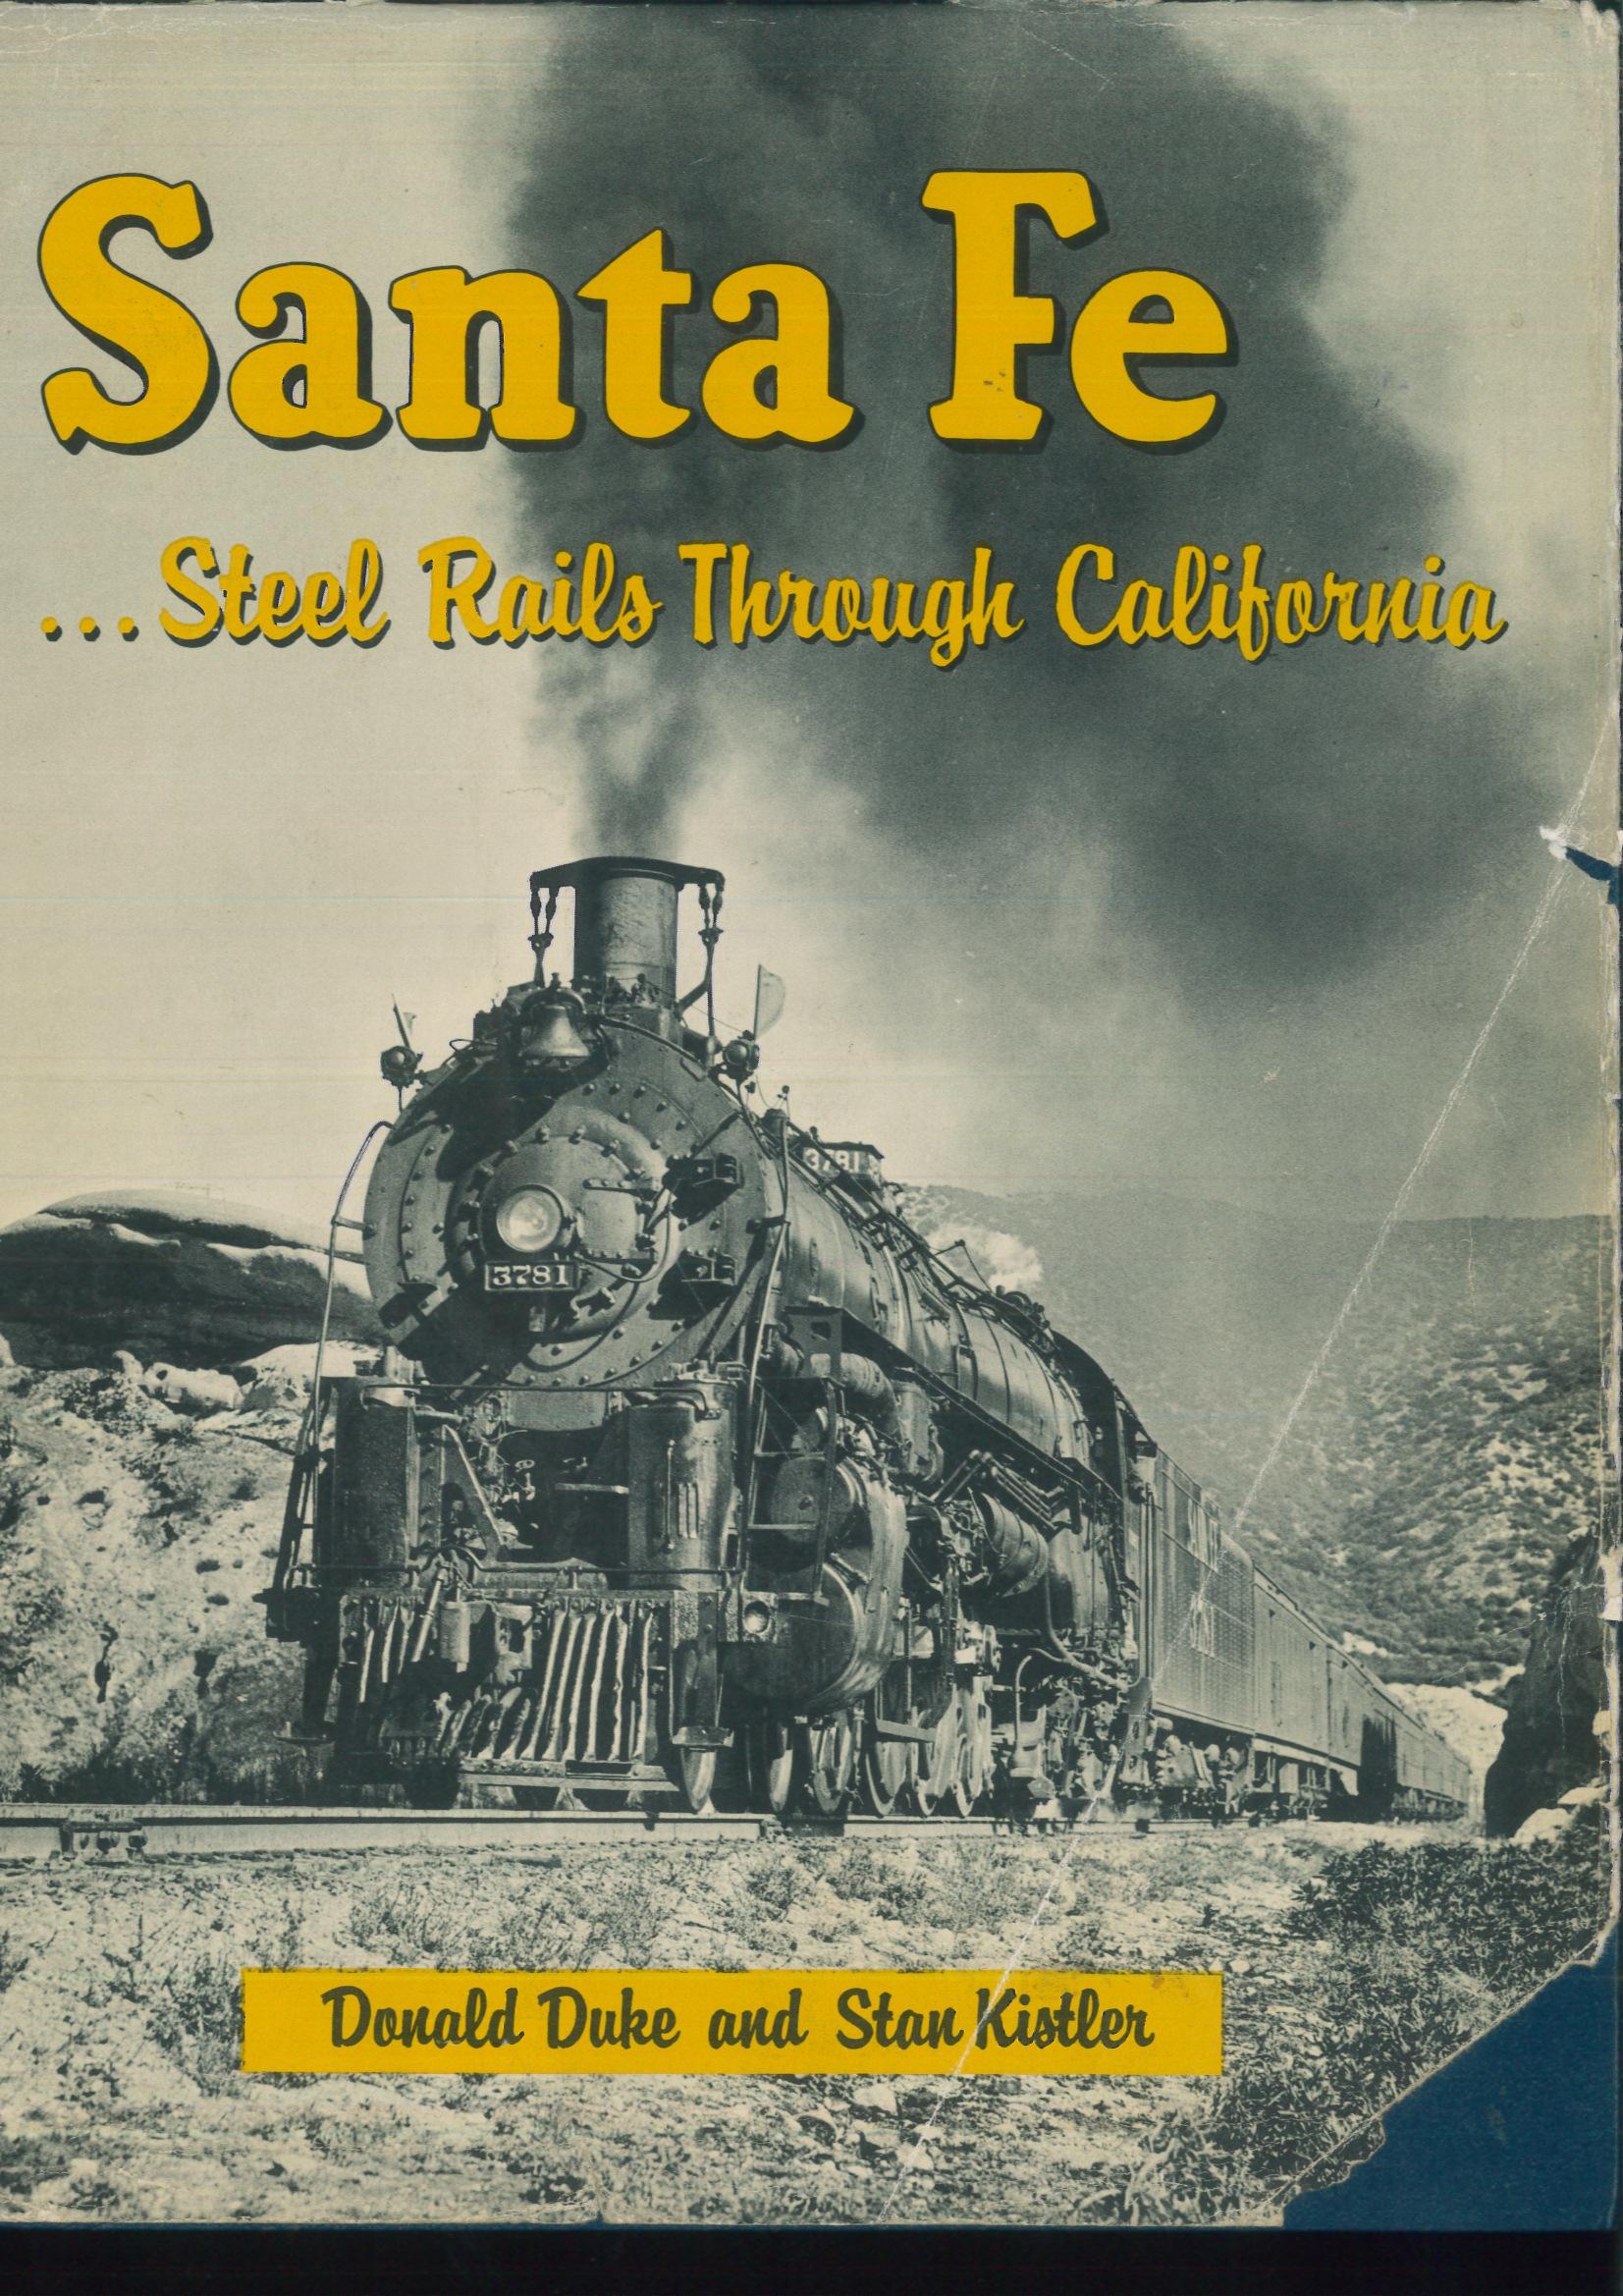 Santa Fe...Steel Rails Through California  - Donals Duke + Stan Kistler | günstig bestellen bei Modelleisenbahn Center  MCS Vertriebs GmbH